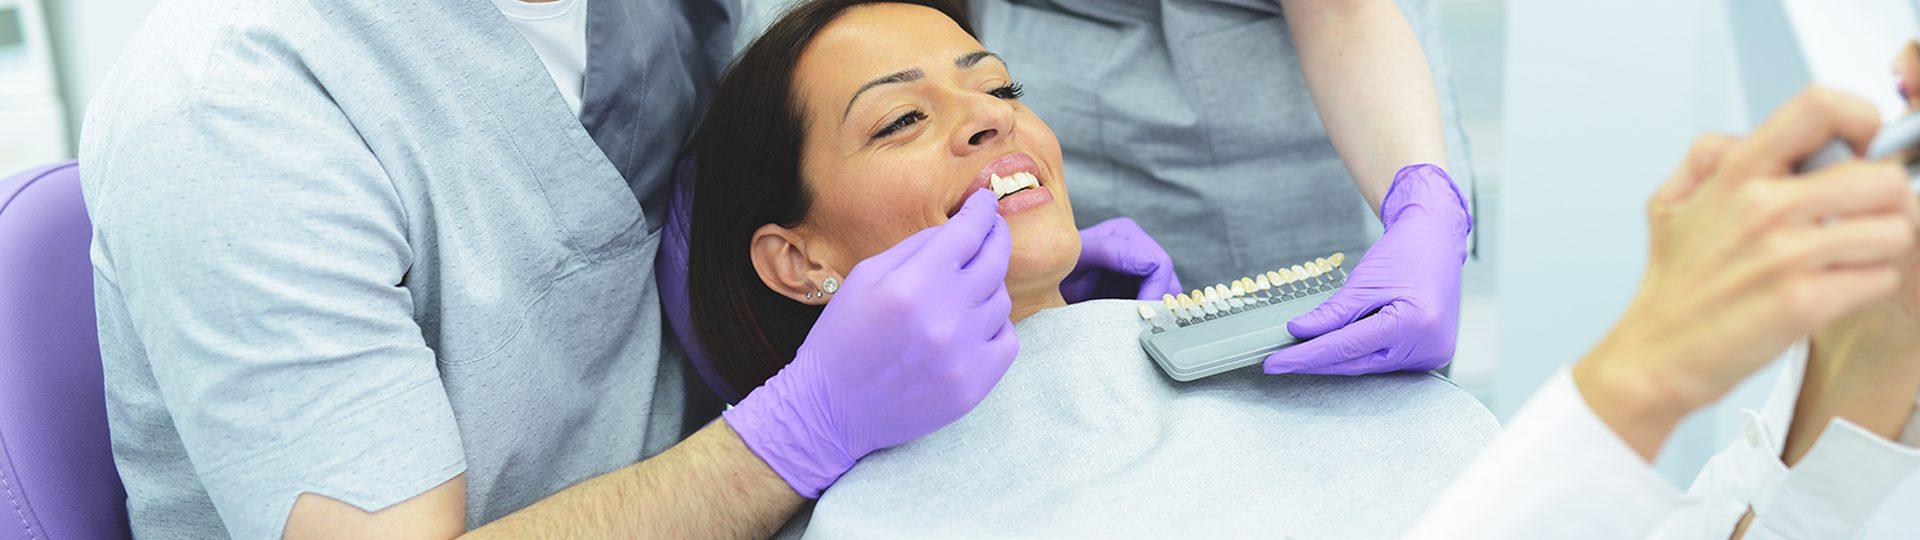 How Many Dental Veneers Do You Need?